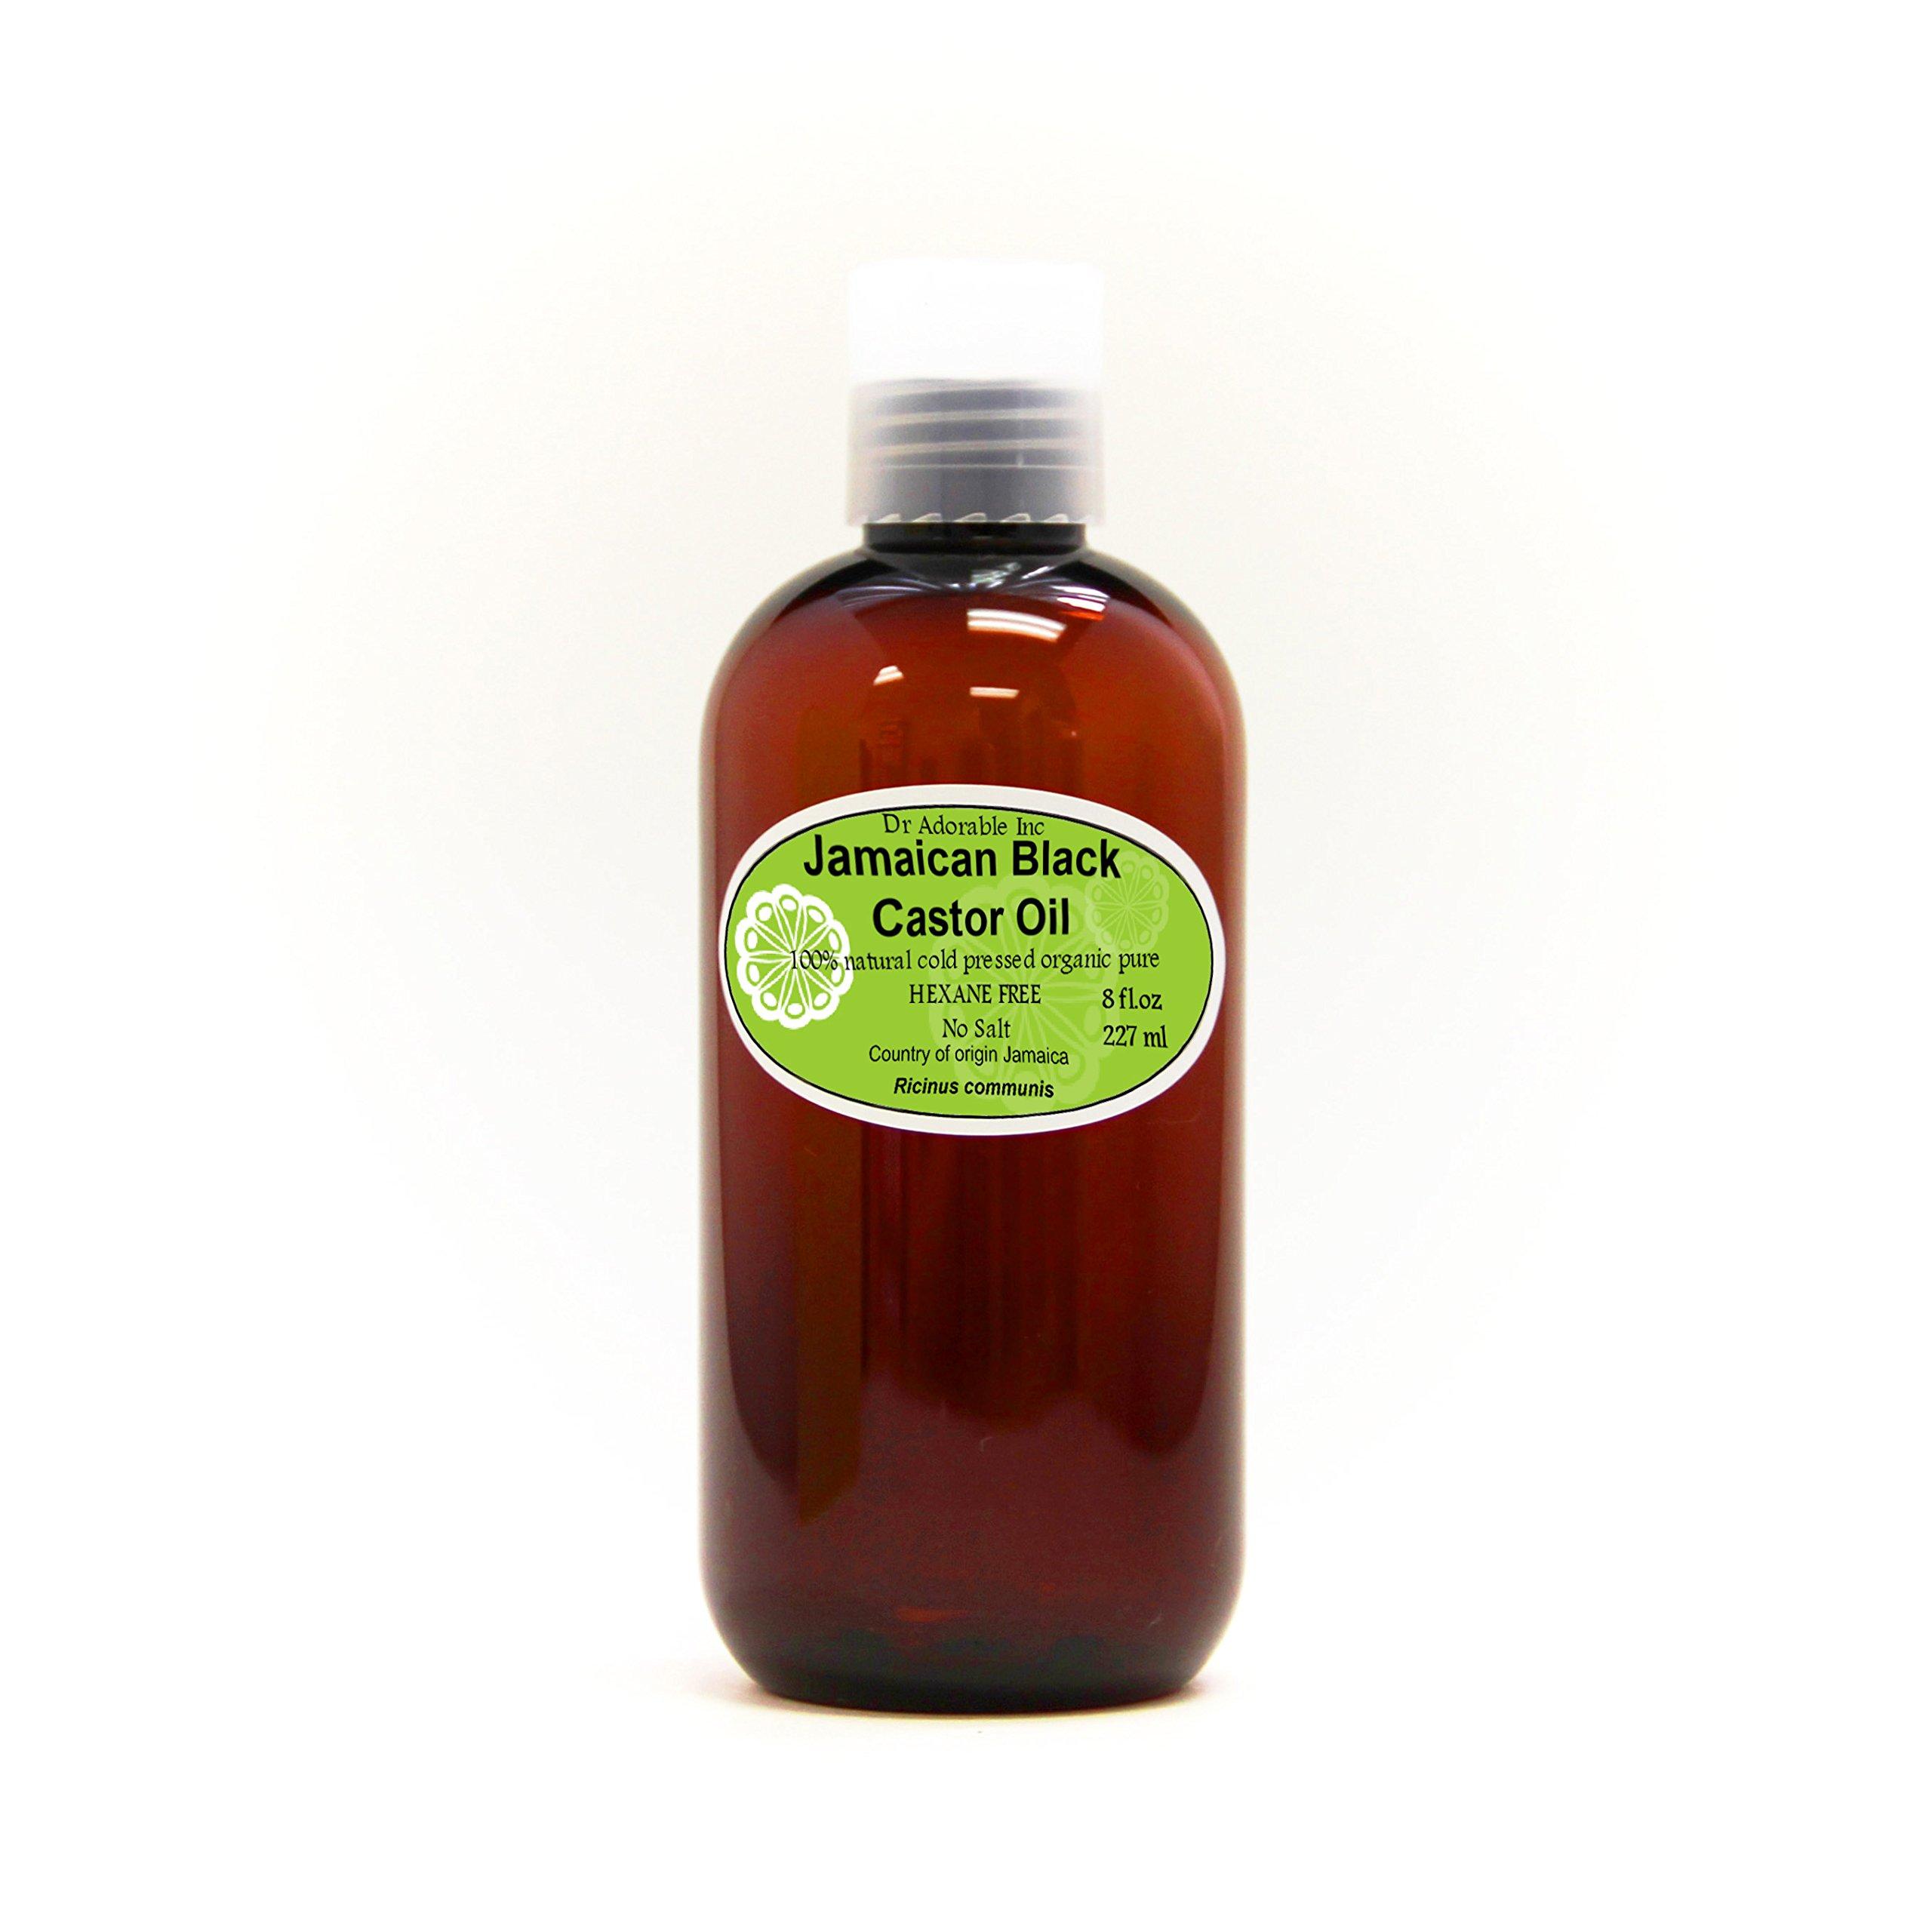 Jamaican Black Castor Oil Premium Best Natural Pure Organic Strengthen Grow & Restore Hair Care 8 oz